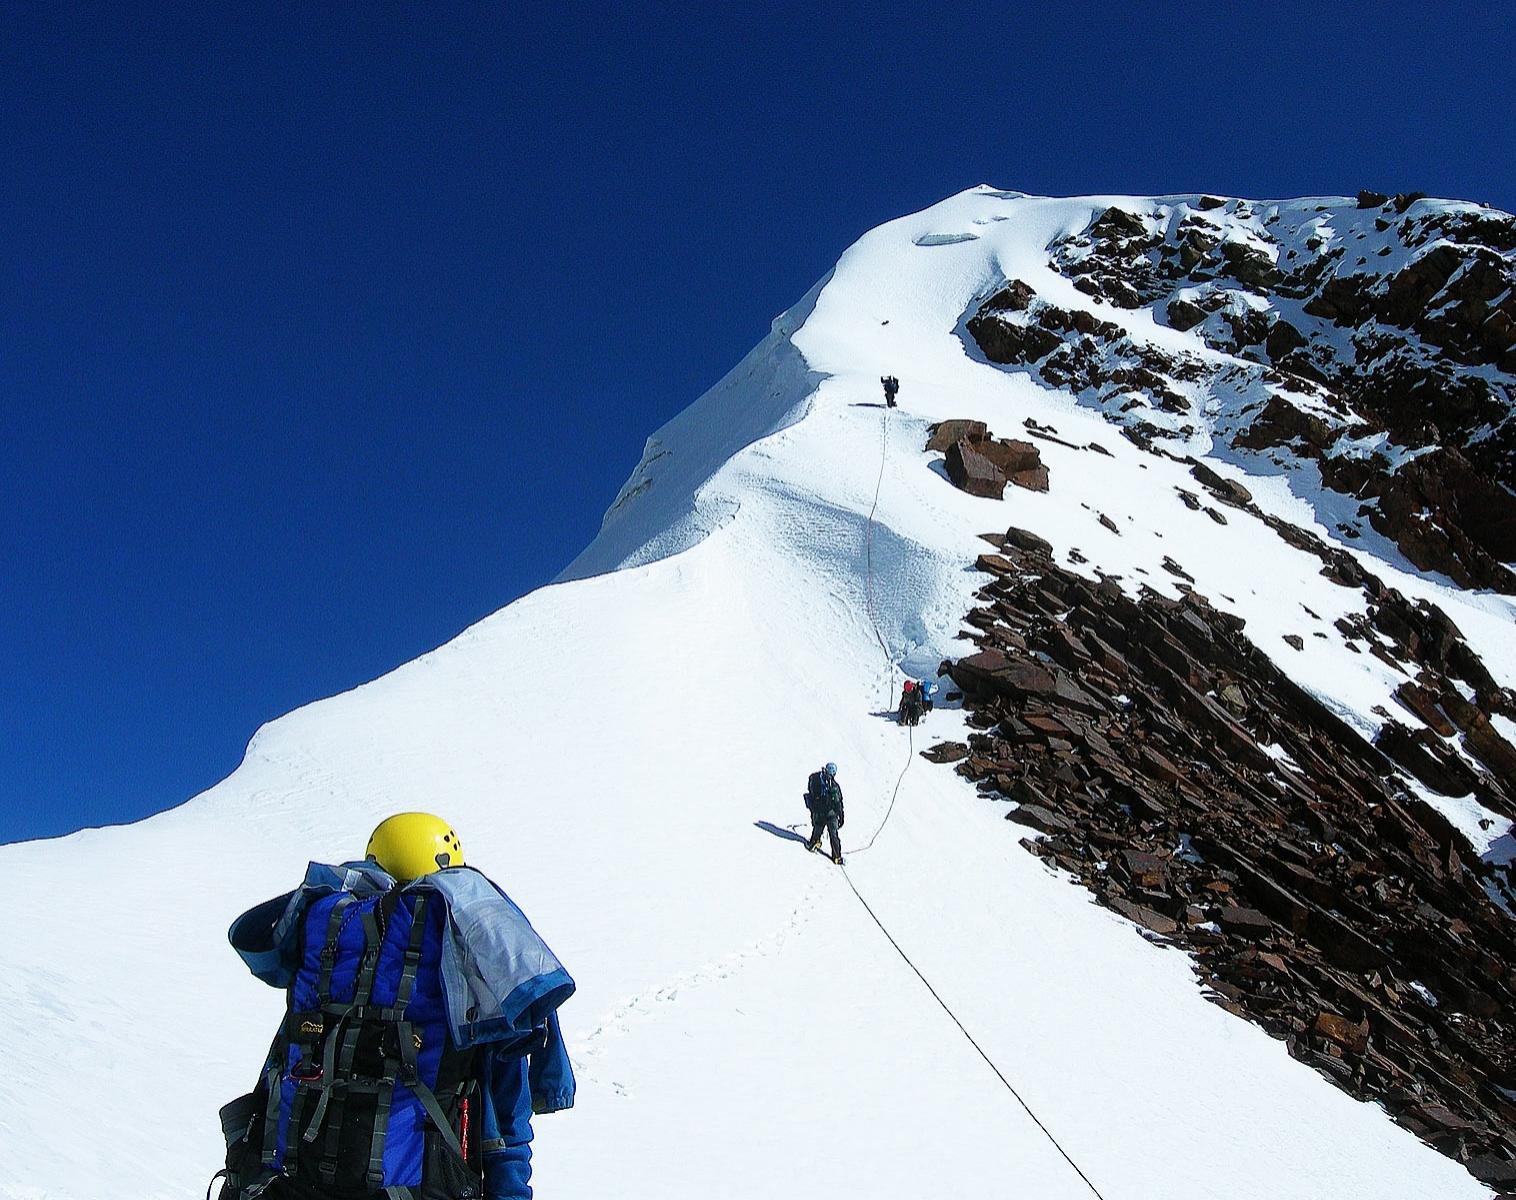 Bolivie  Camp de haute montagne   Alpinisme